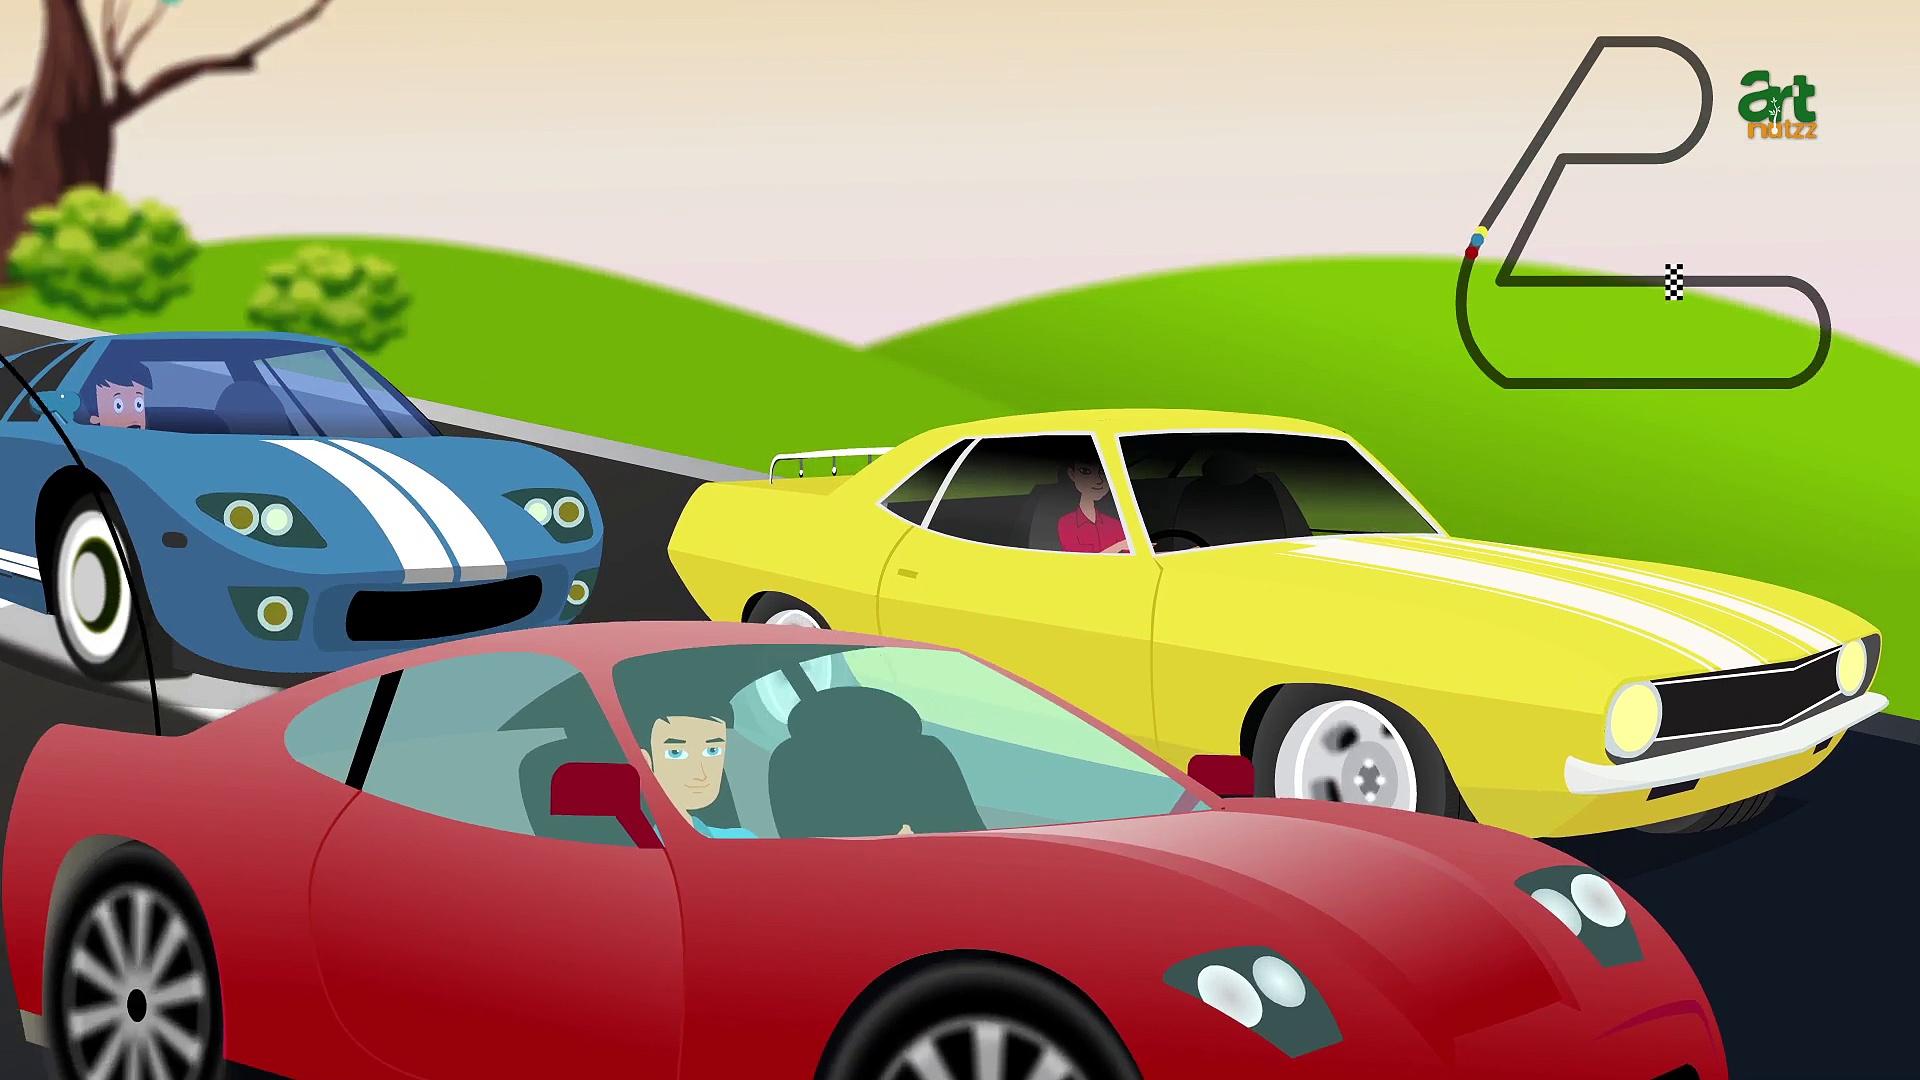 cars|kids cars|toys cars|mcqueen cars|kids cars|artnutzz